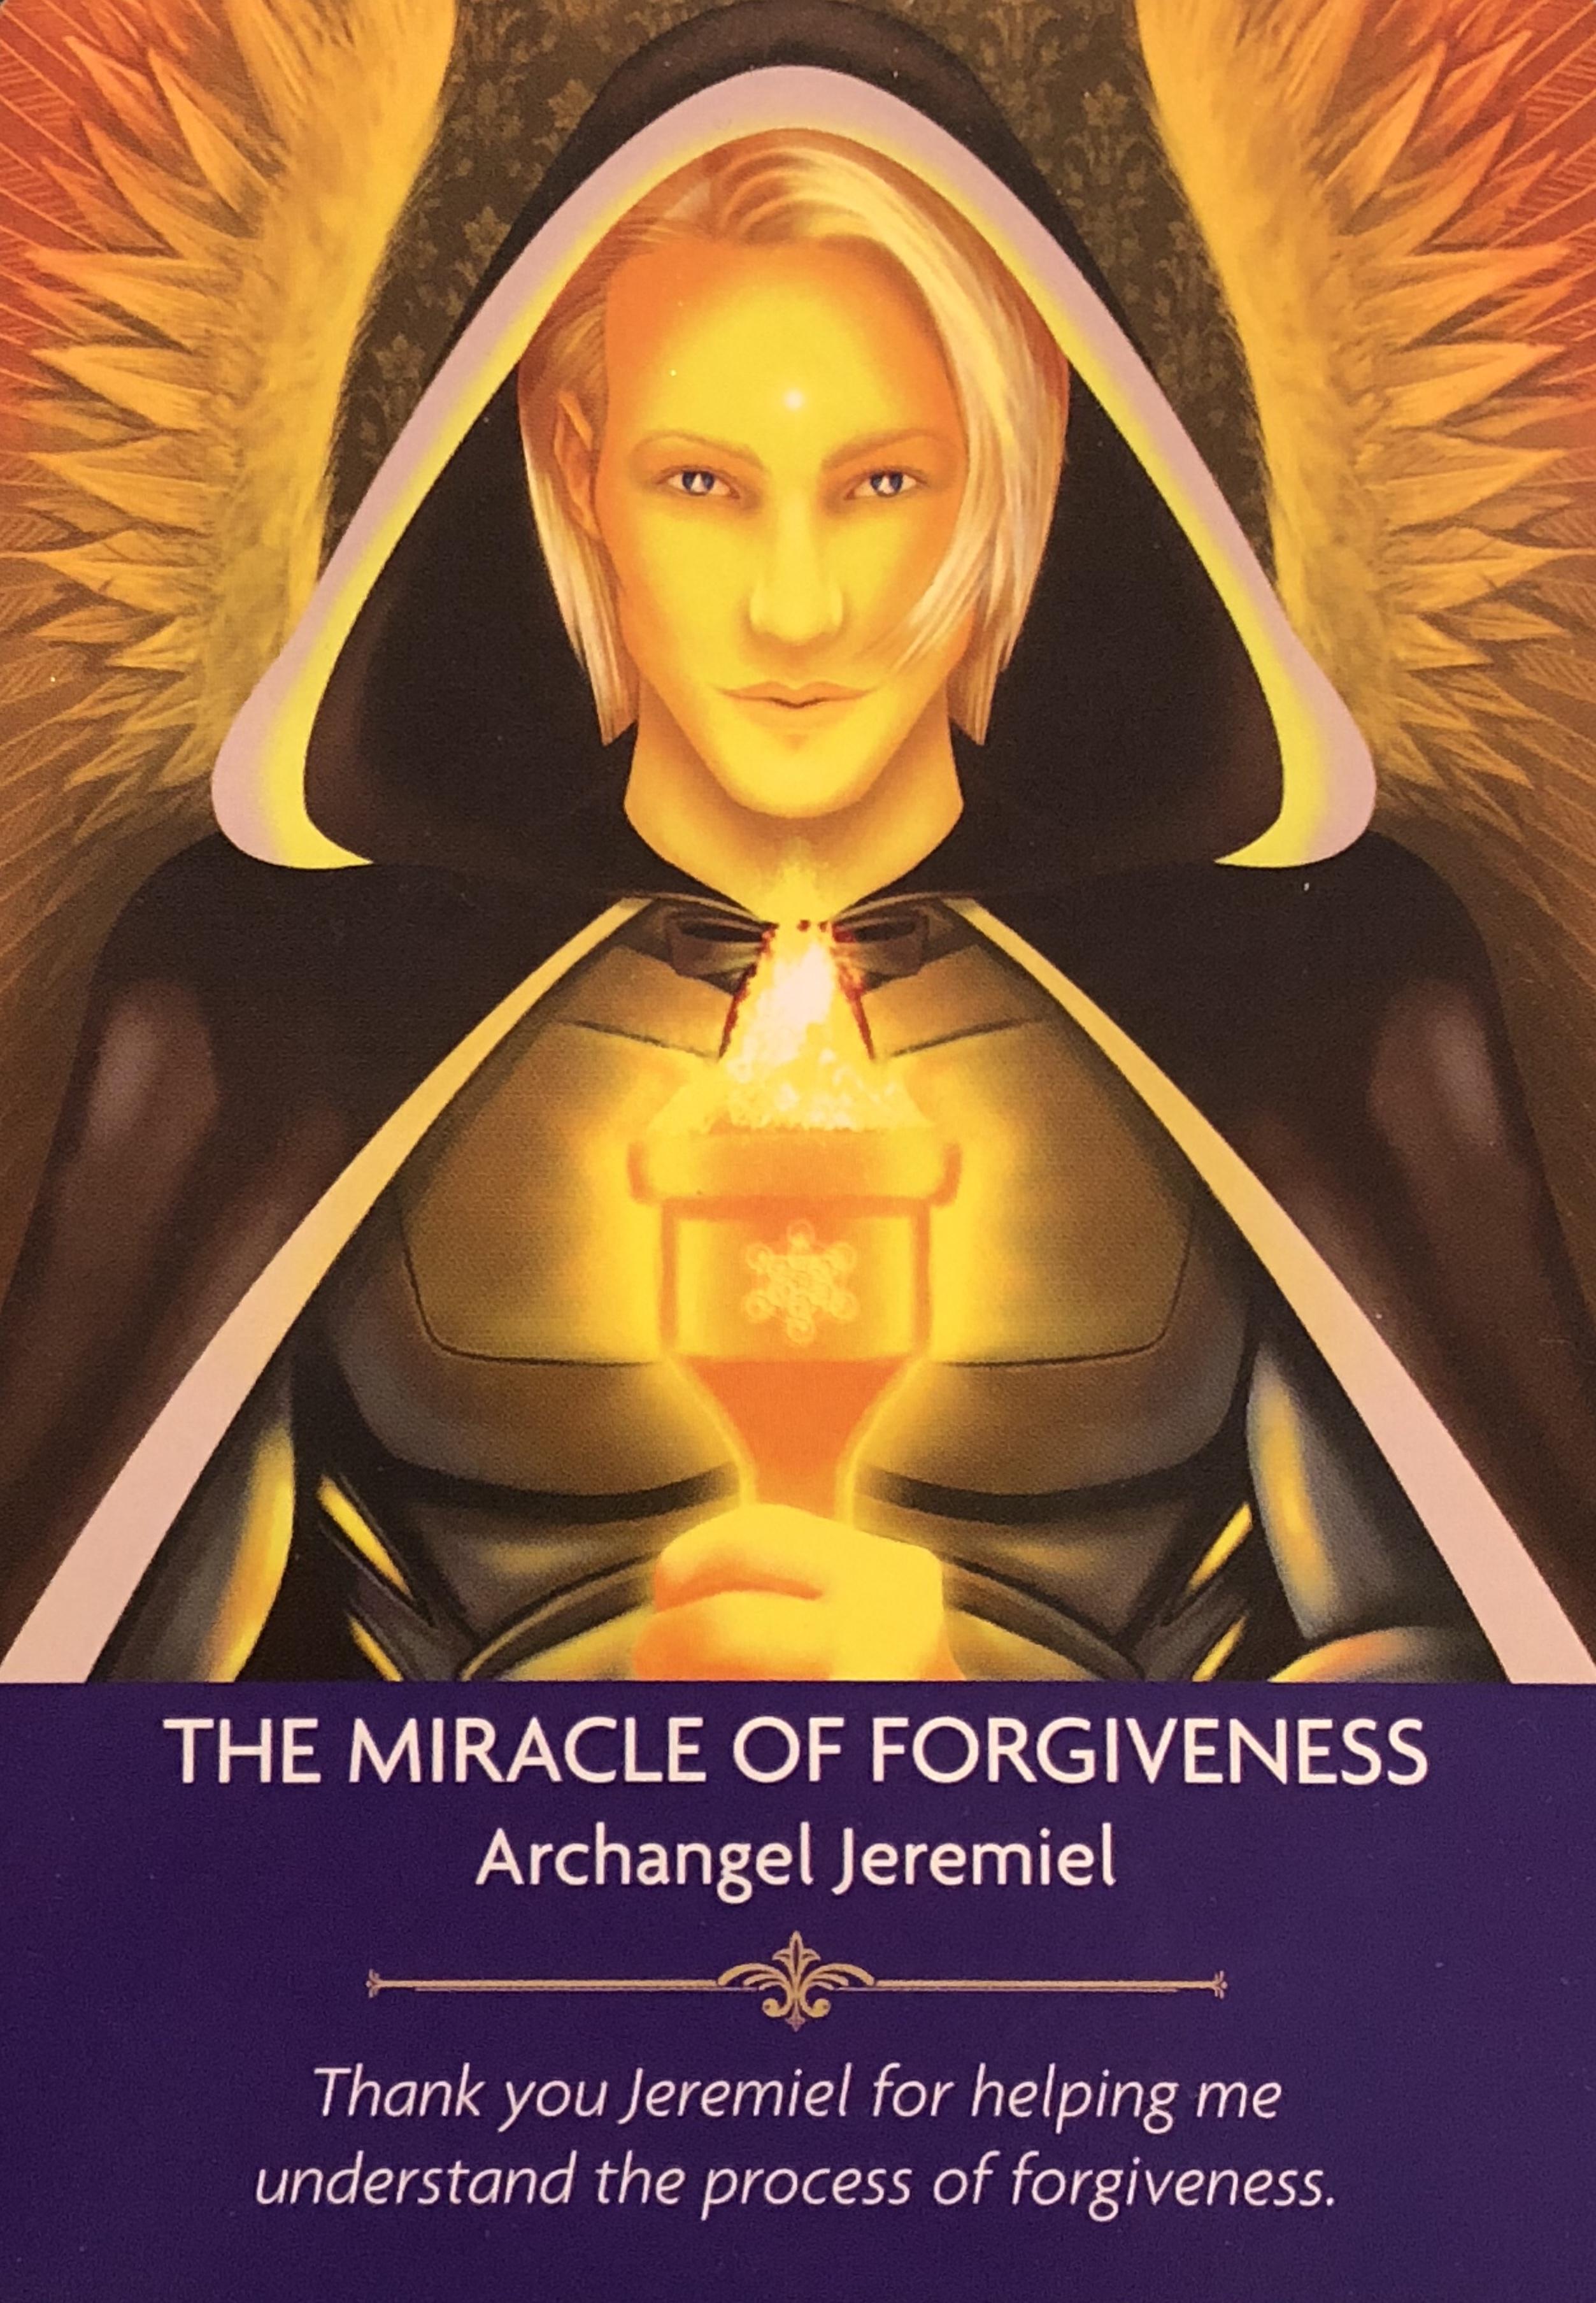 archangel jeremiel archangel oracle divine guidance